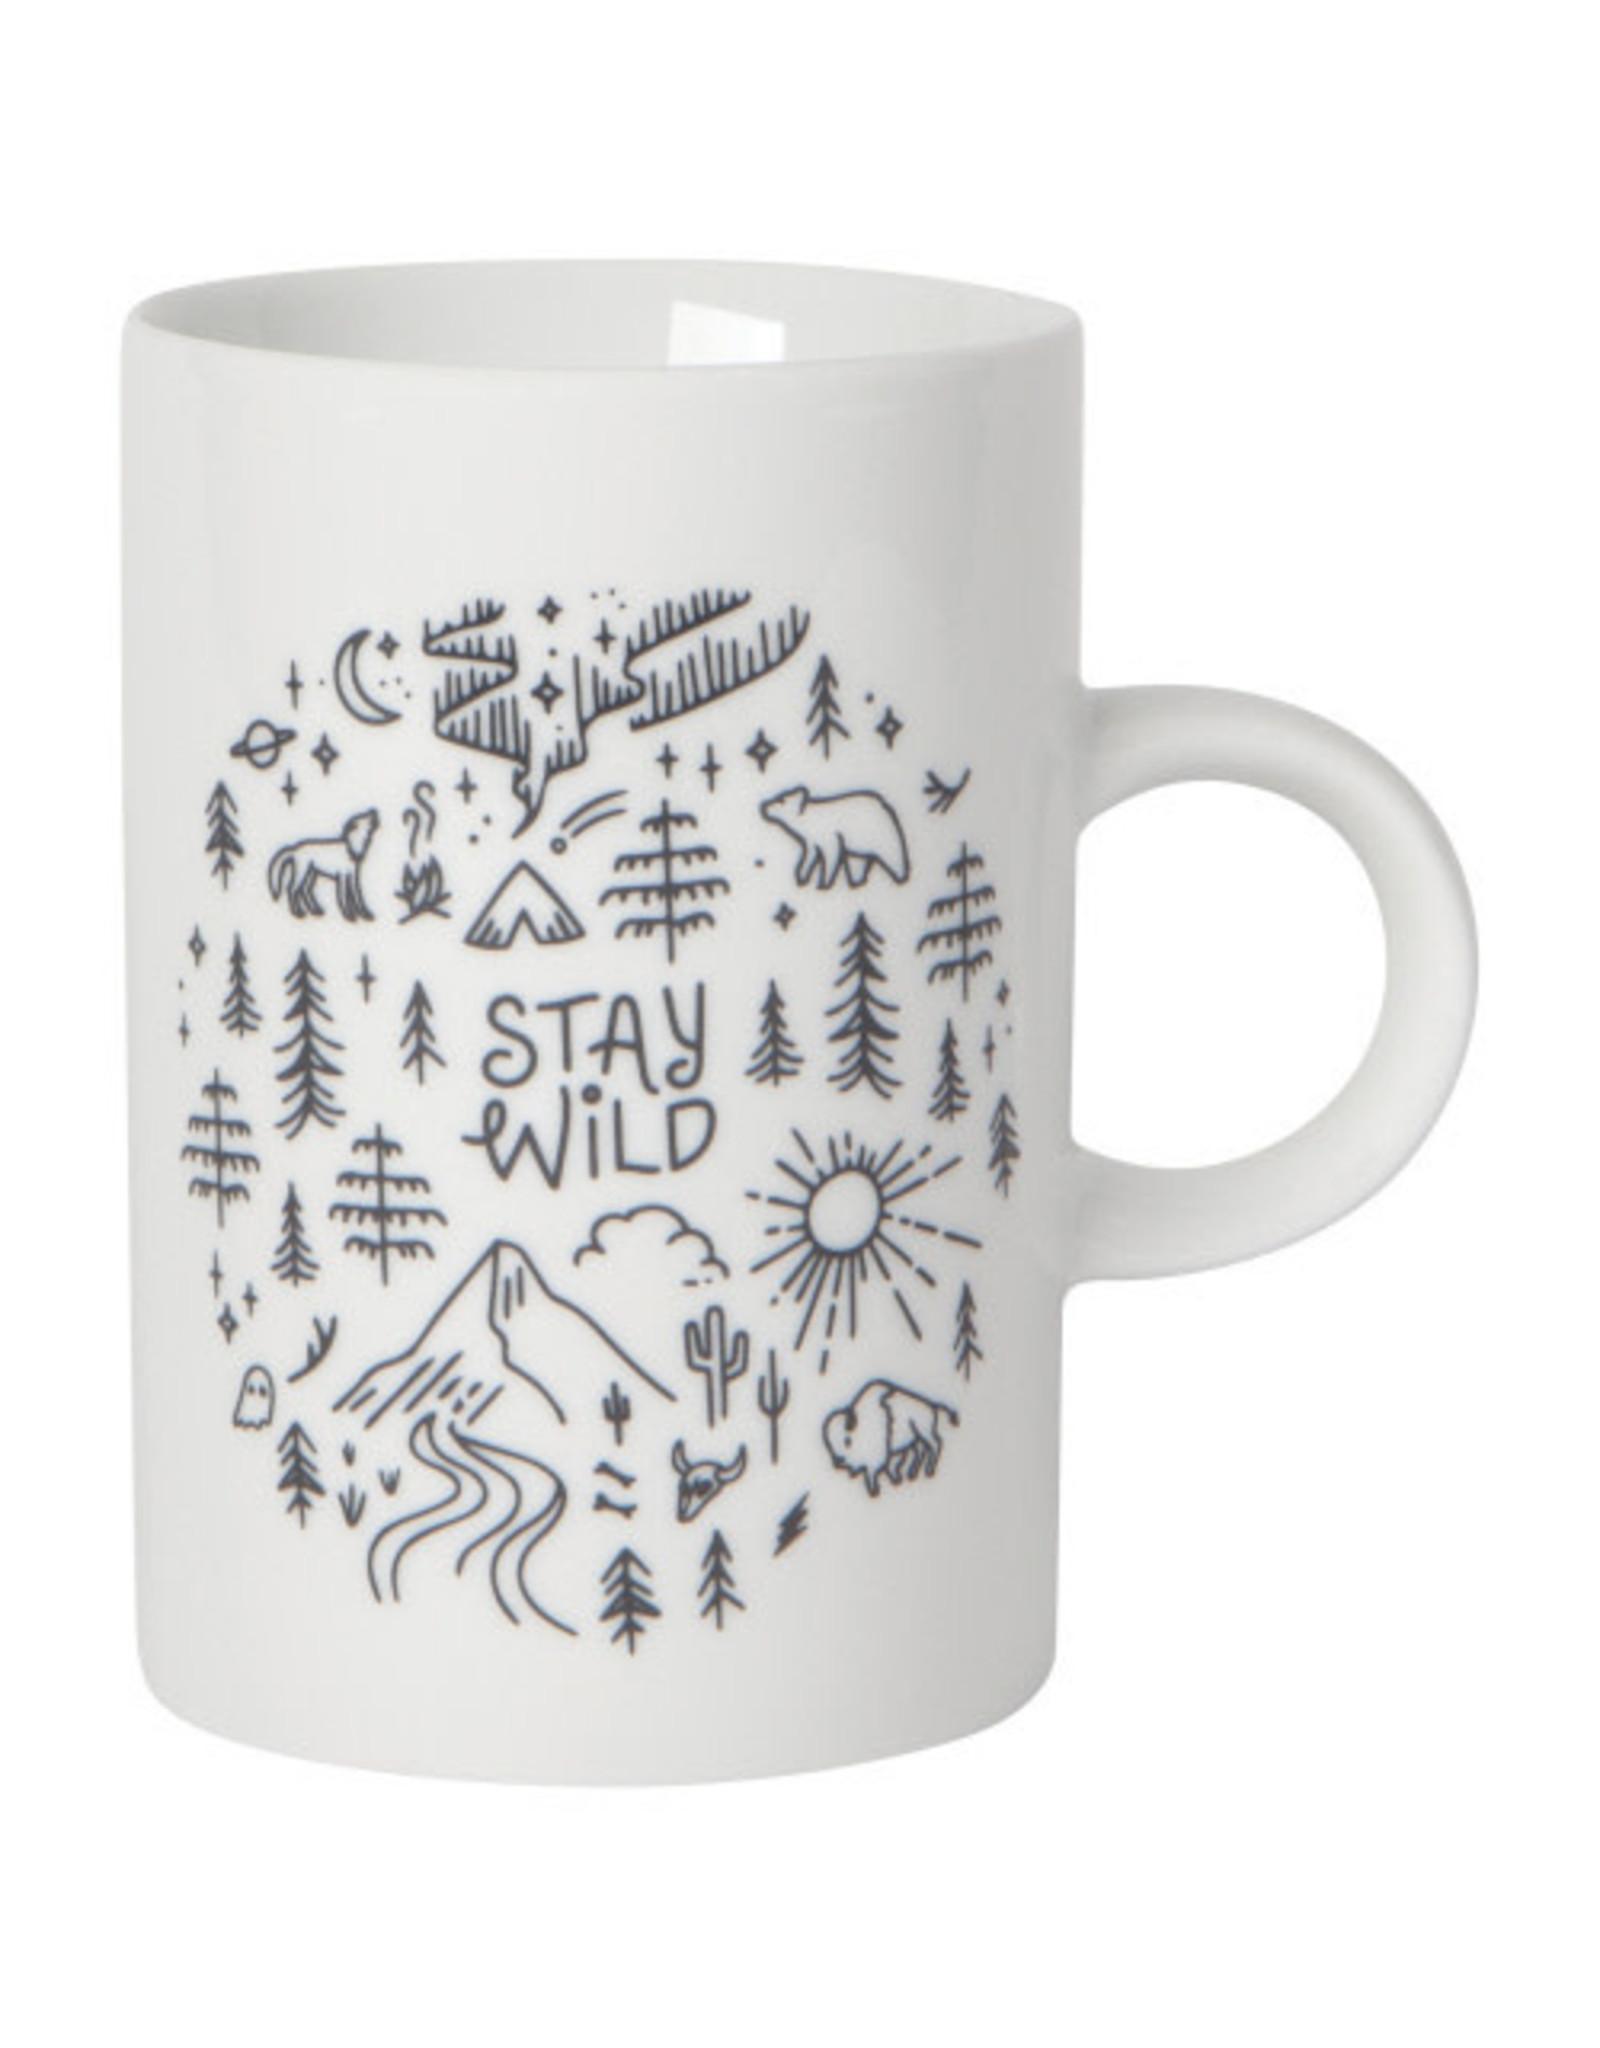 Stay Wild Mug